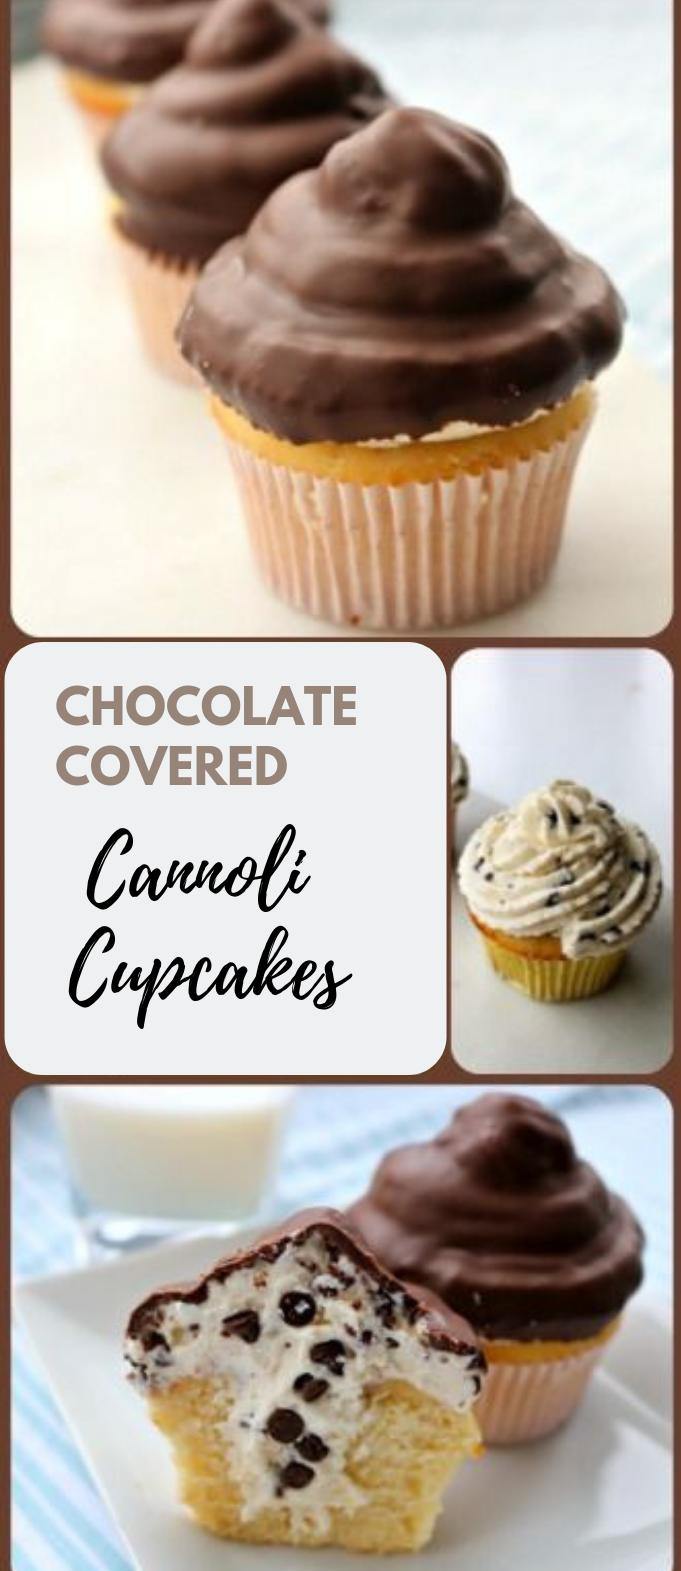 CHOCOLATE COVERED CANNOLI CUPCAKES #chocolate #yummy